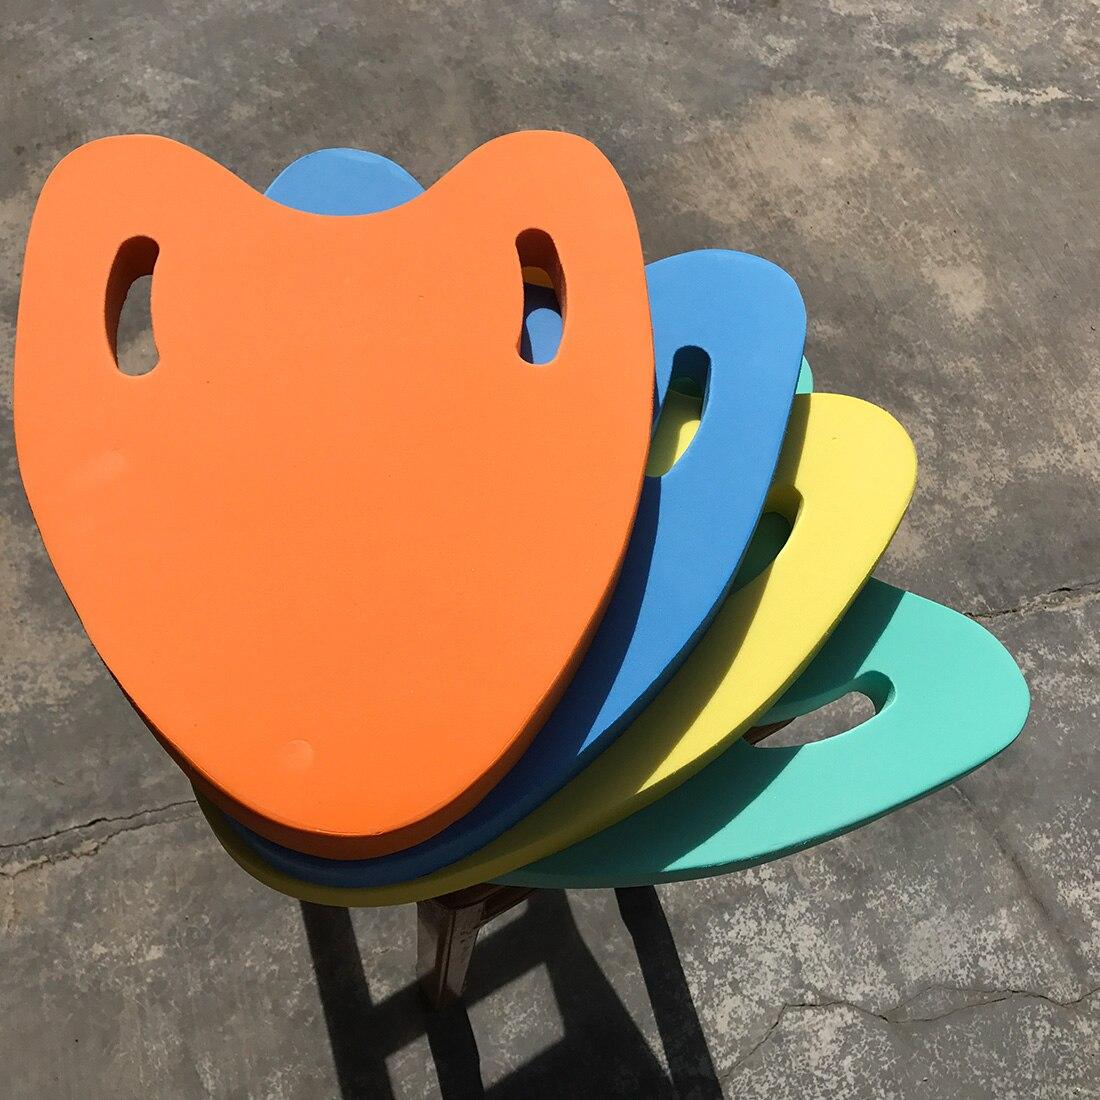 Hot 1PCs A Shape EVA Back Float Kickboard Swimming Board Floating Plate Pool Float Training Aid Tools For Adult & Children